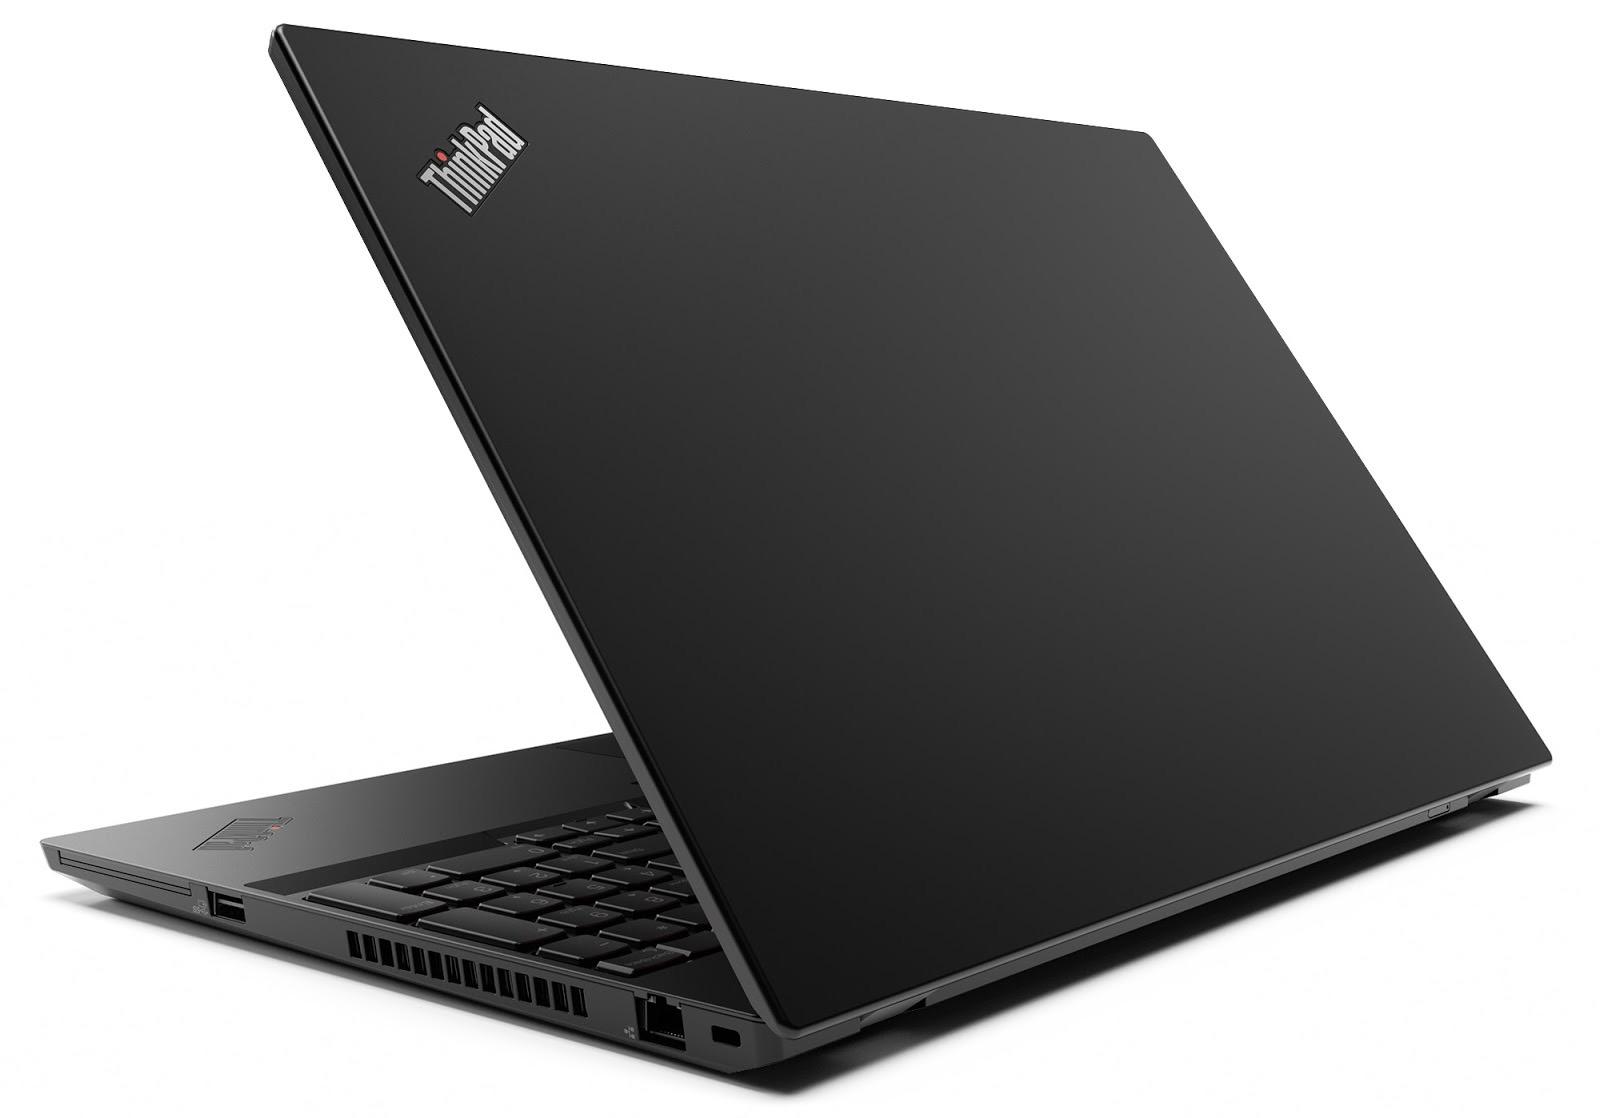 Фото 2. Ноутбук Lenovo ThinkPad T15 Gen 1 Black (20S6000MRT)